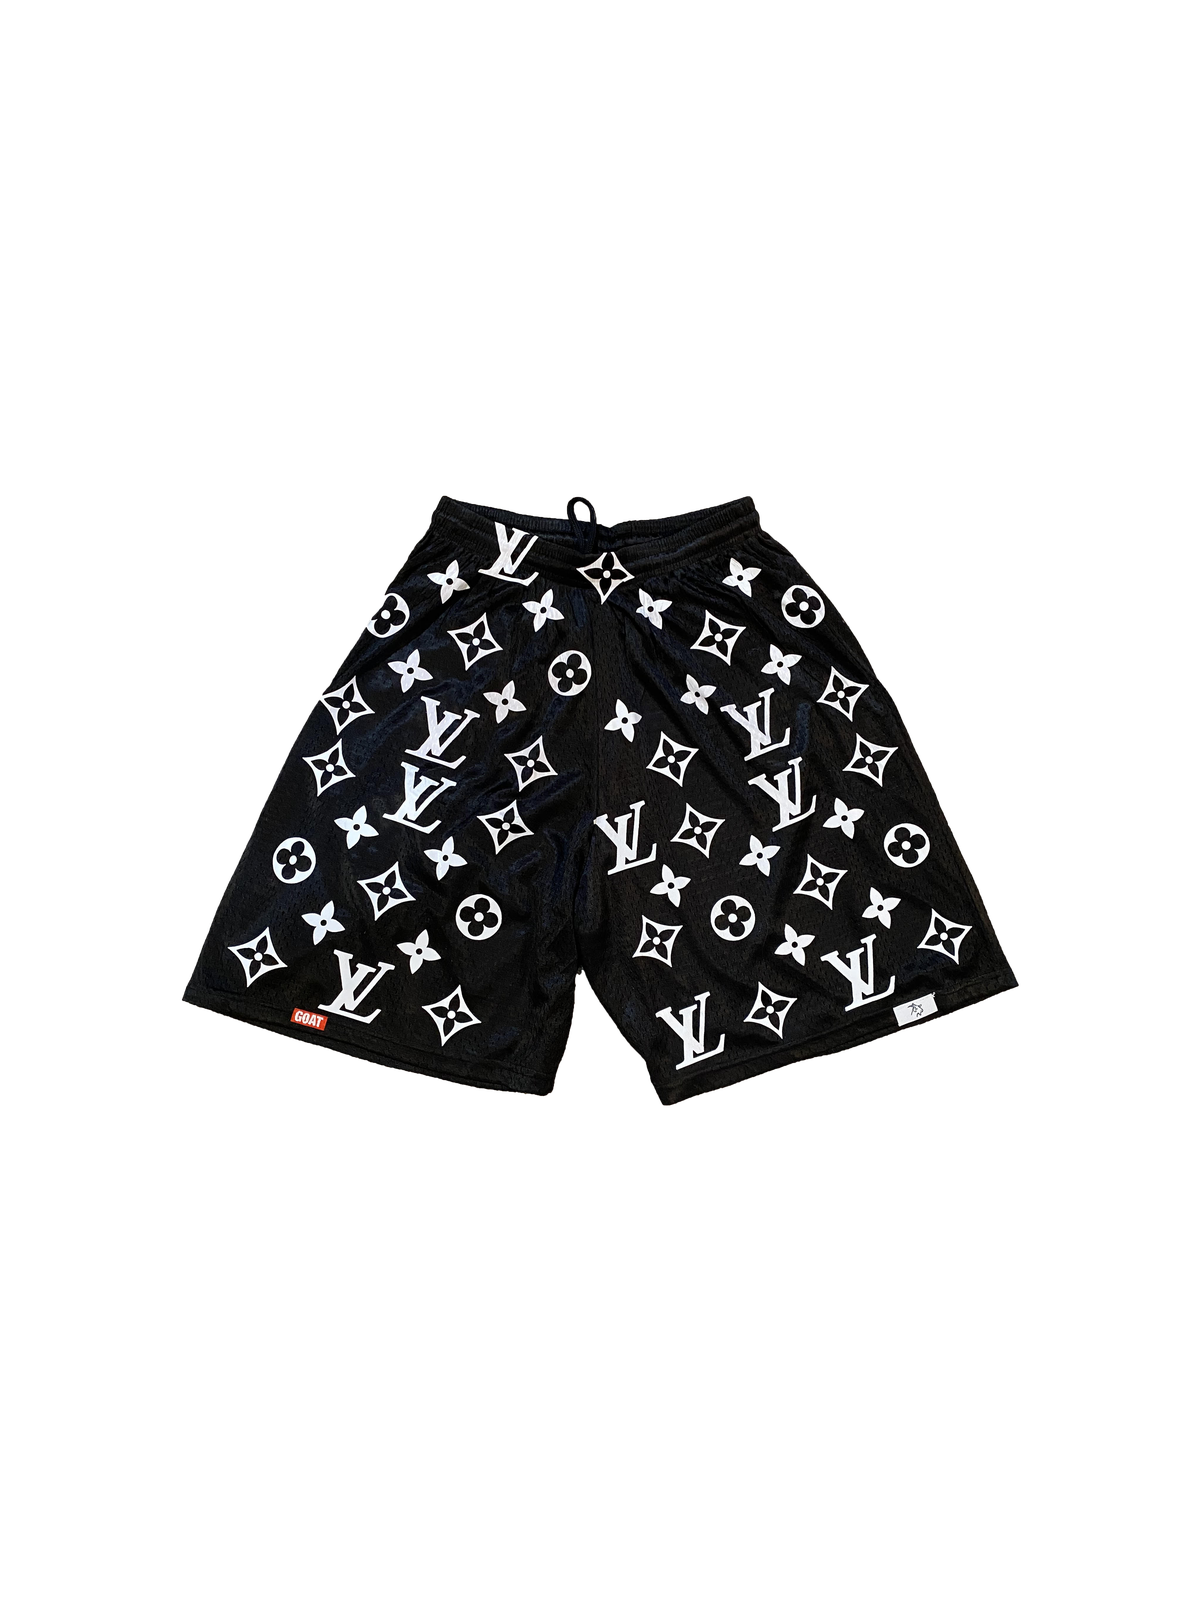 Limited Edition LV Print Shorts